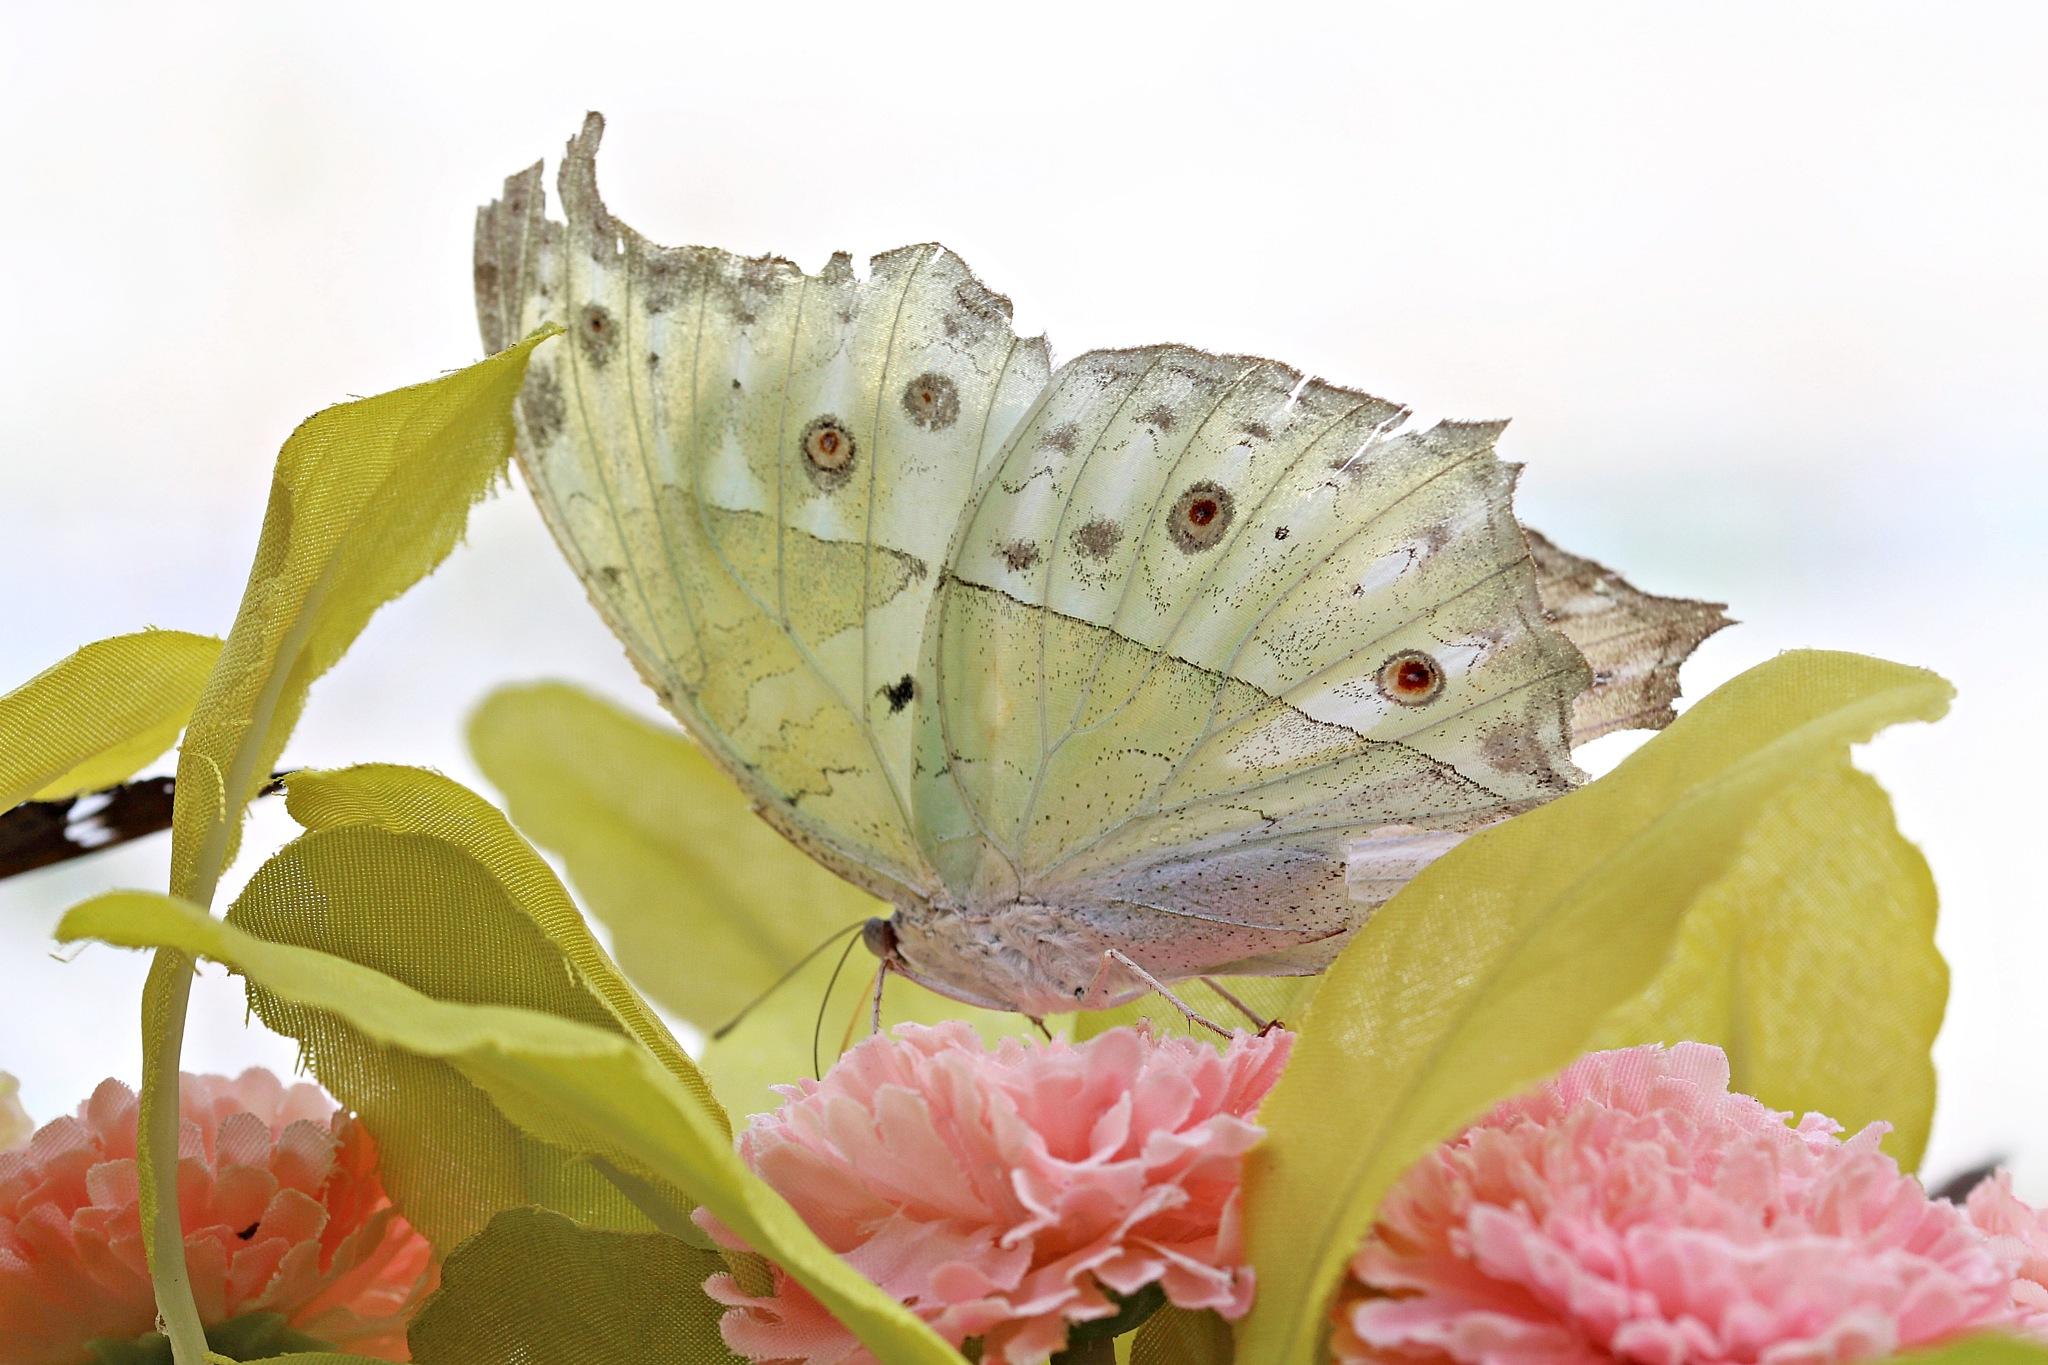 Butterfly light by Giuseppe Criseo